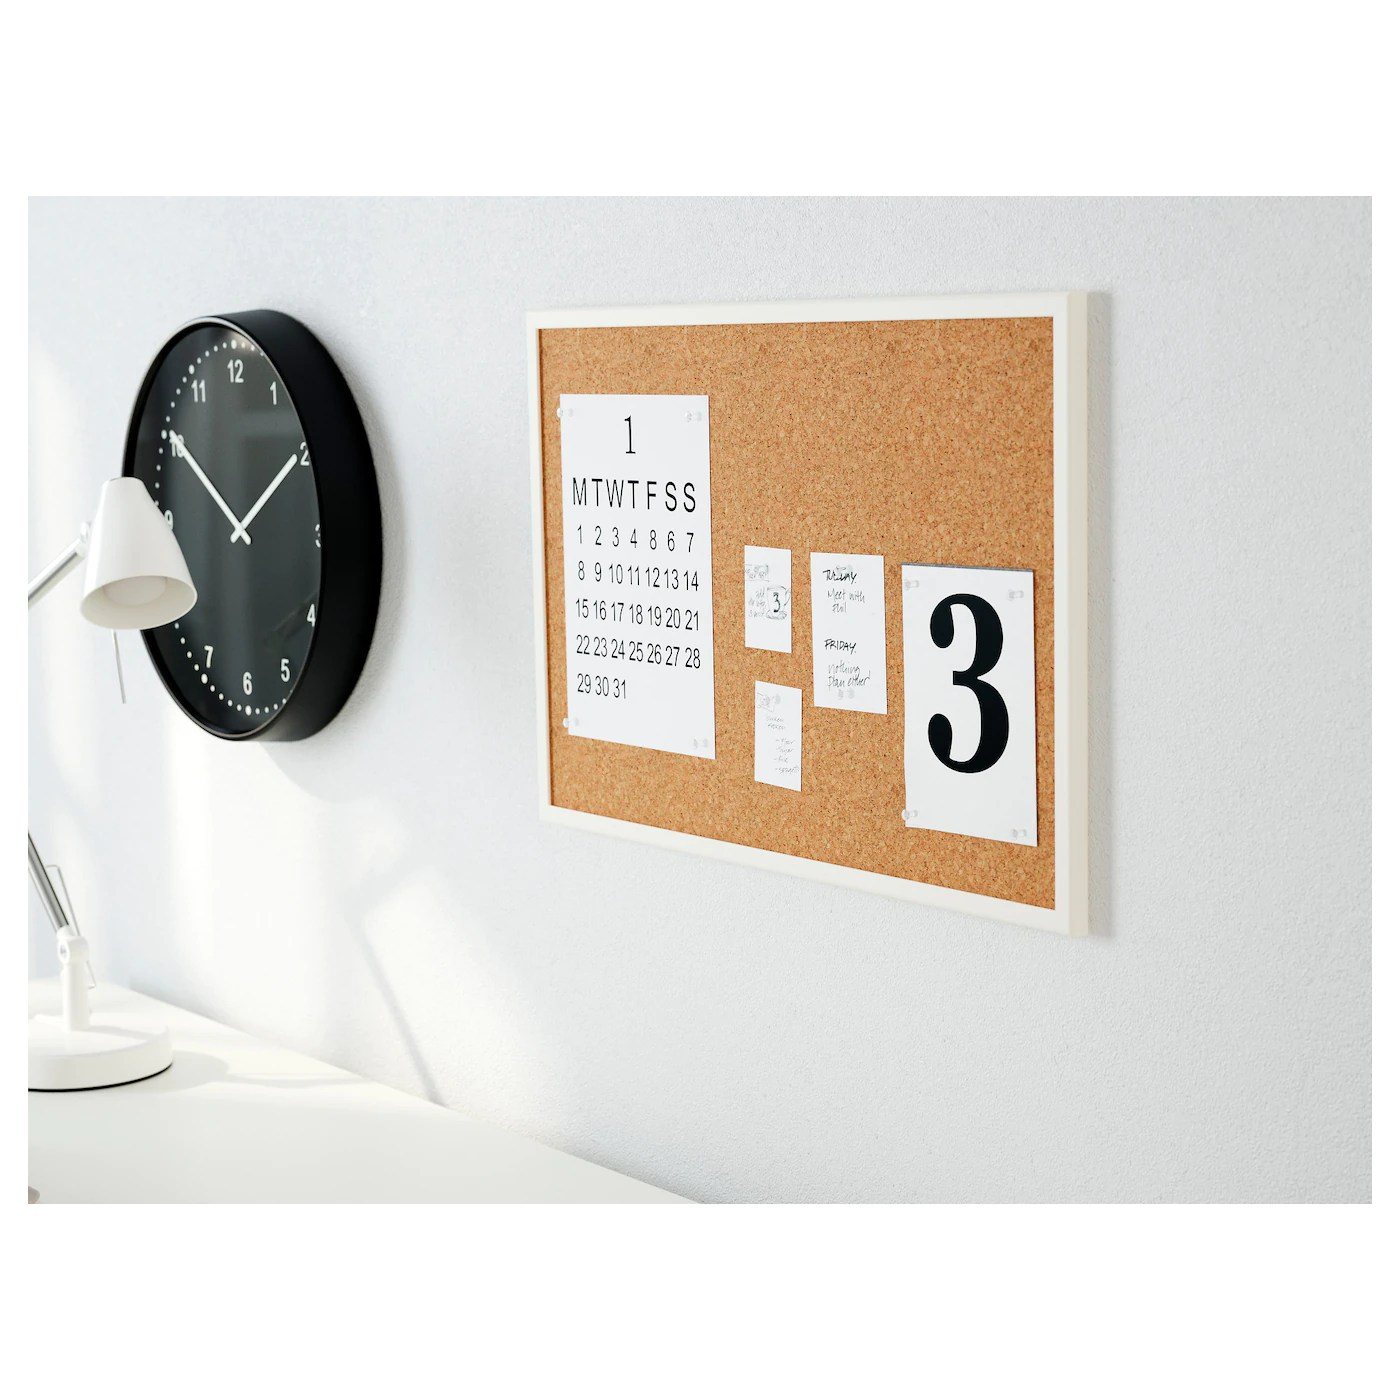 Vaggis Tableau Memo Avec Epingles Blanc Materiau Durable Ikea